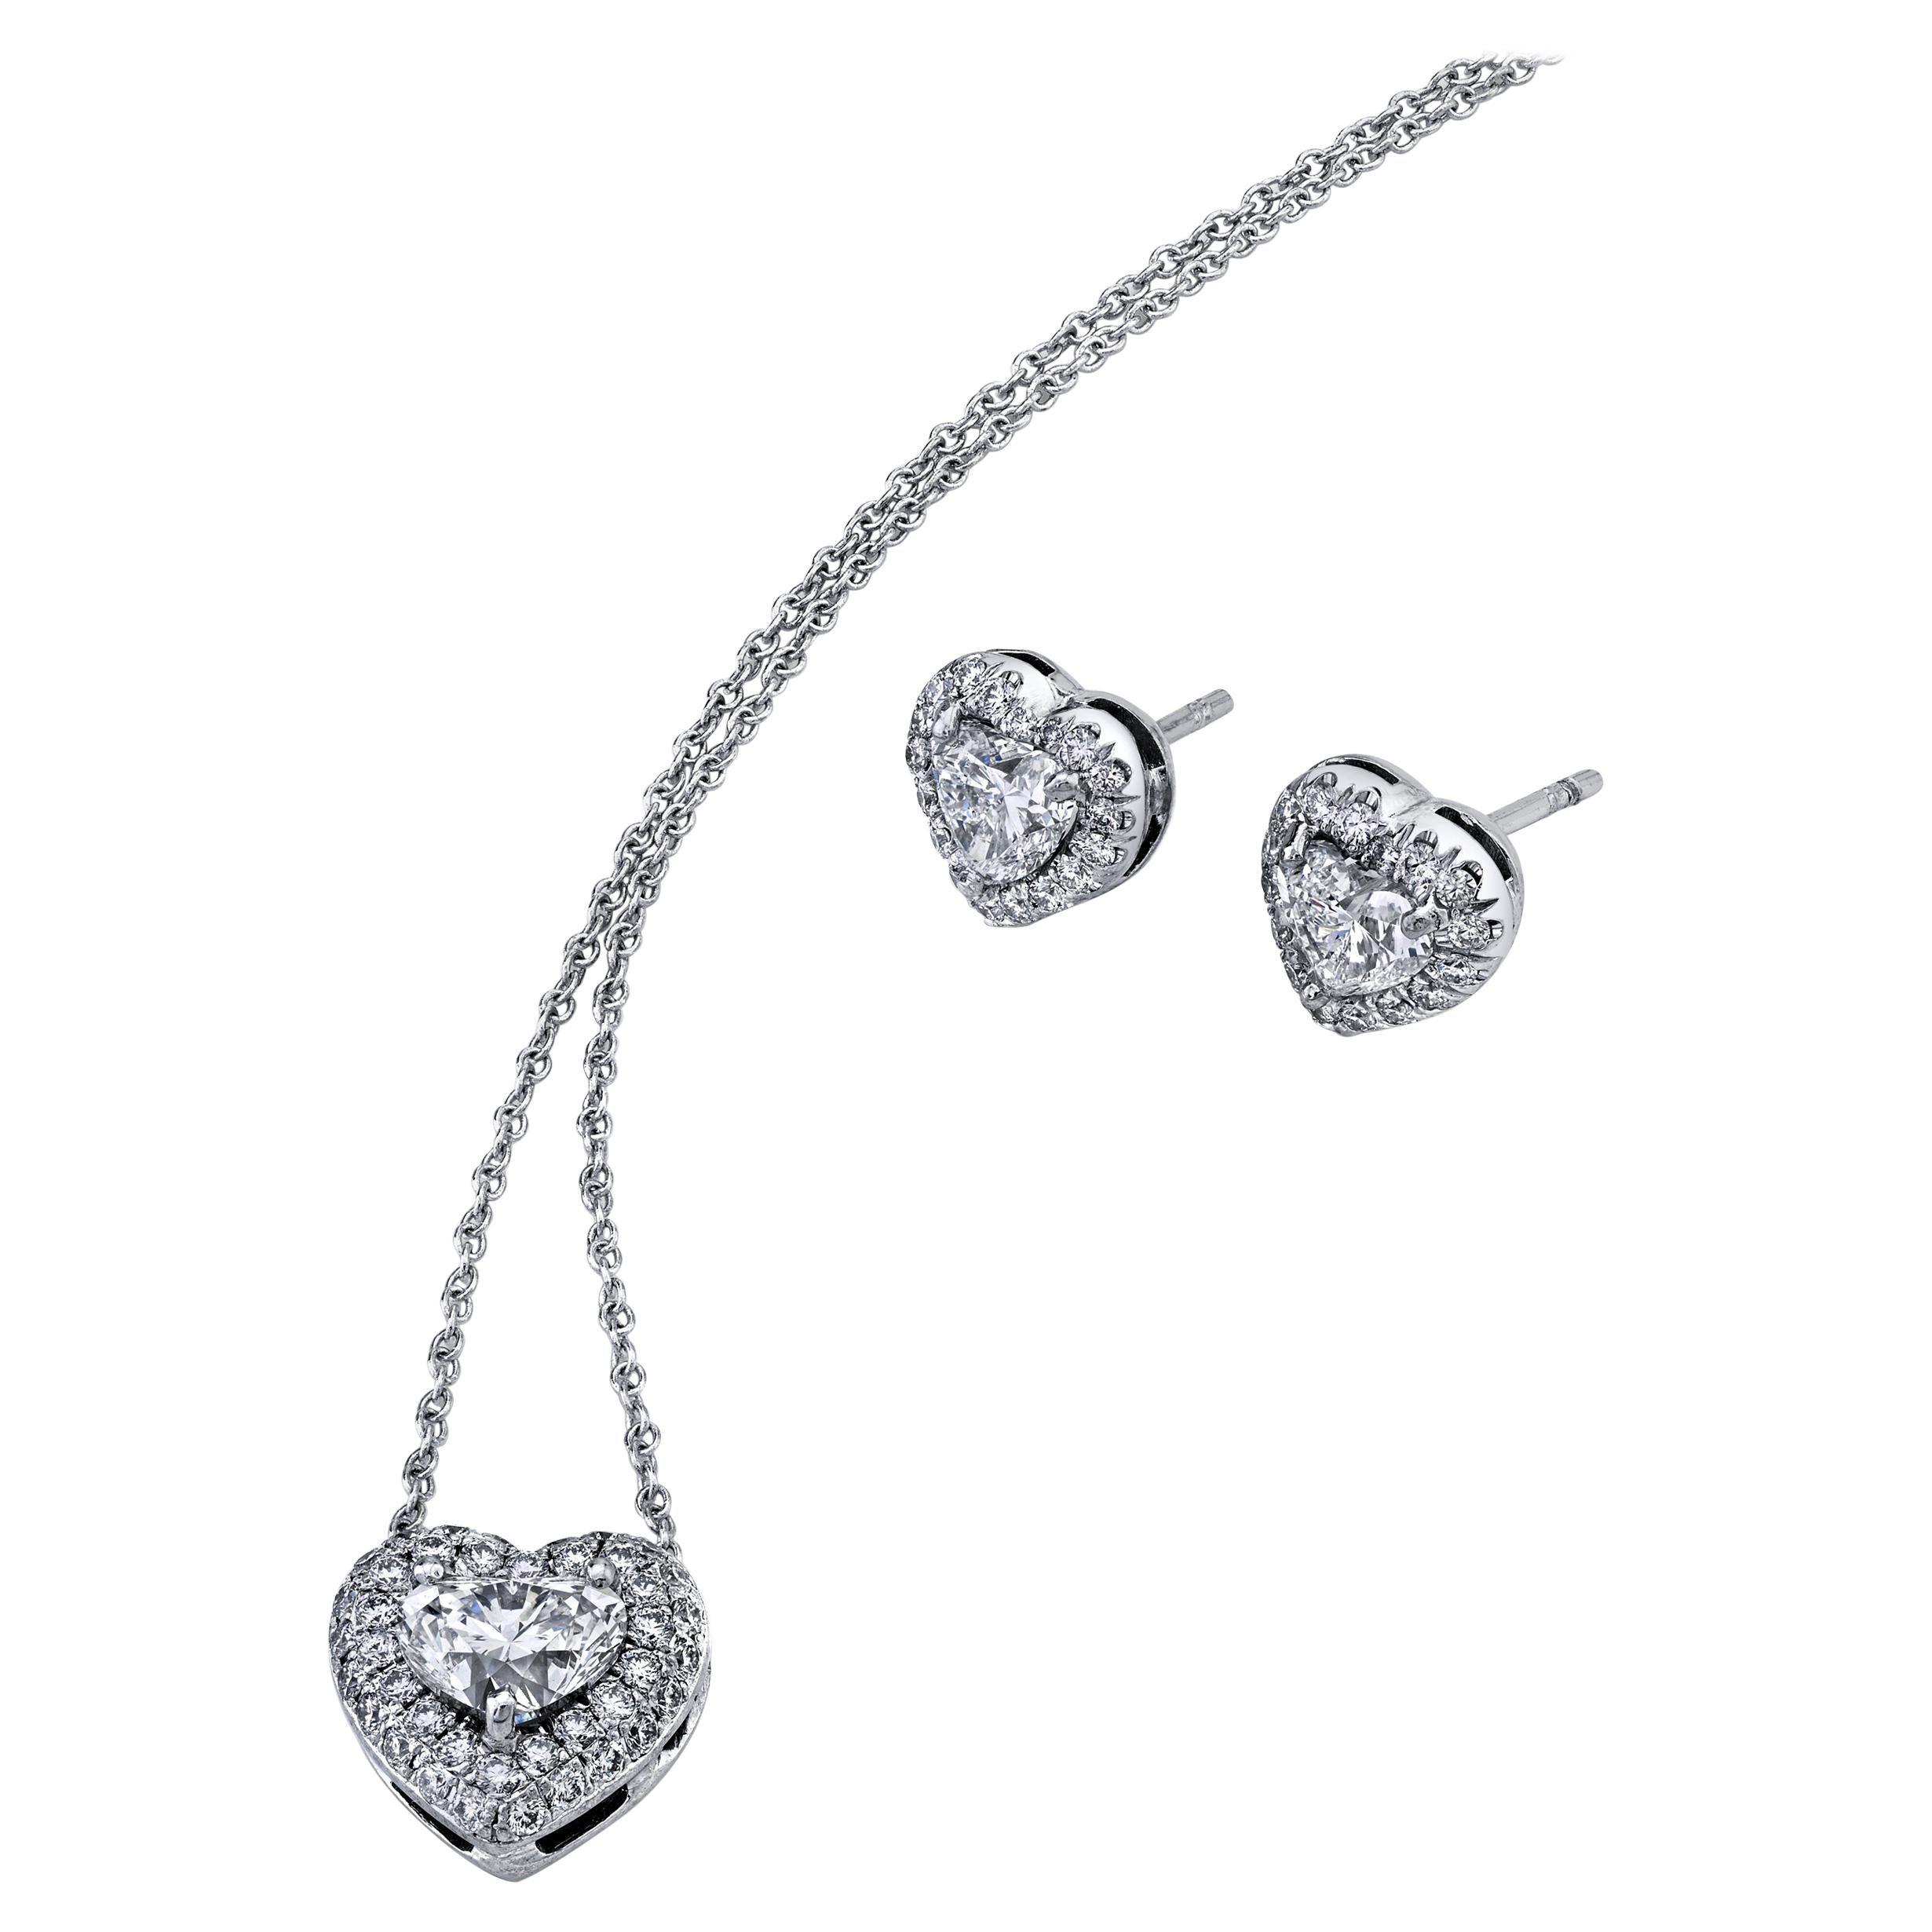 Heart Shape Diamond Earrings and Pendant Set 2.79 Carat Platinum/18KWG